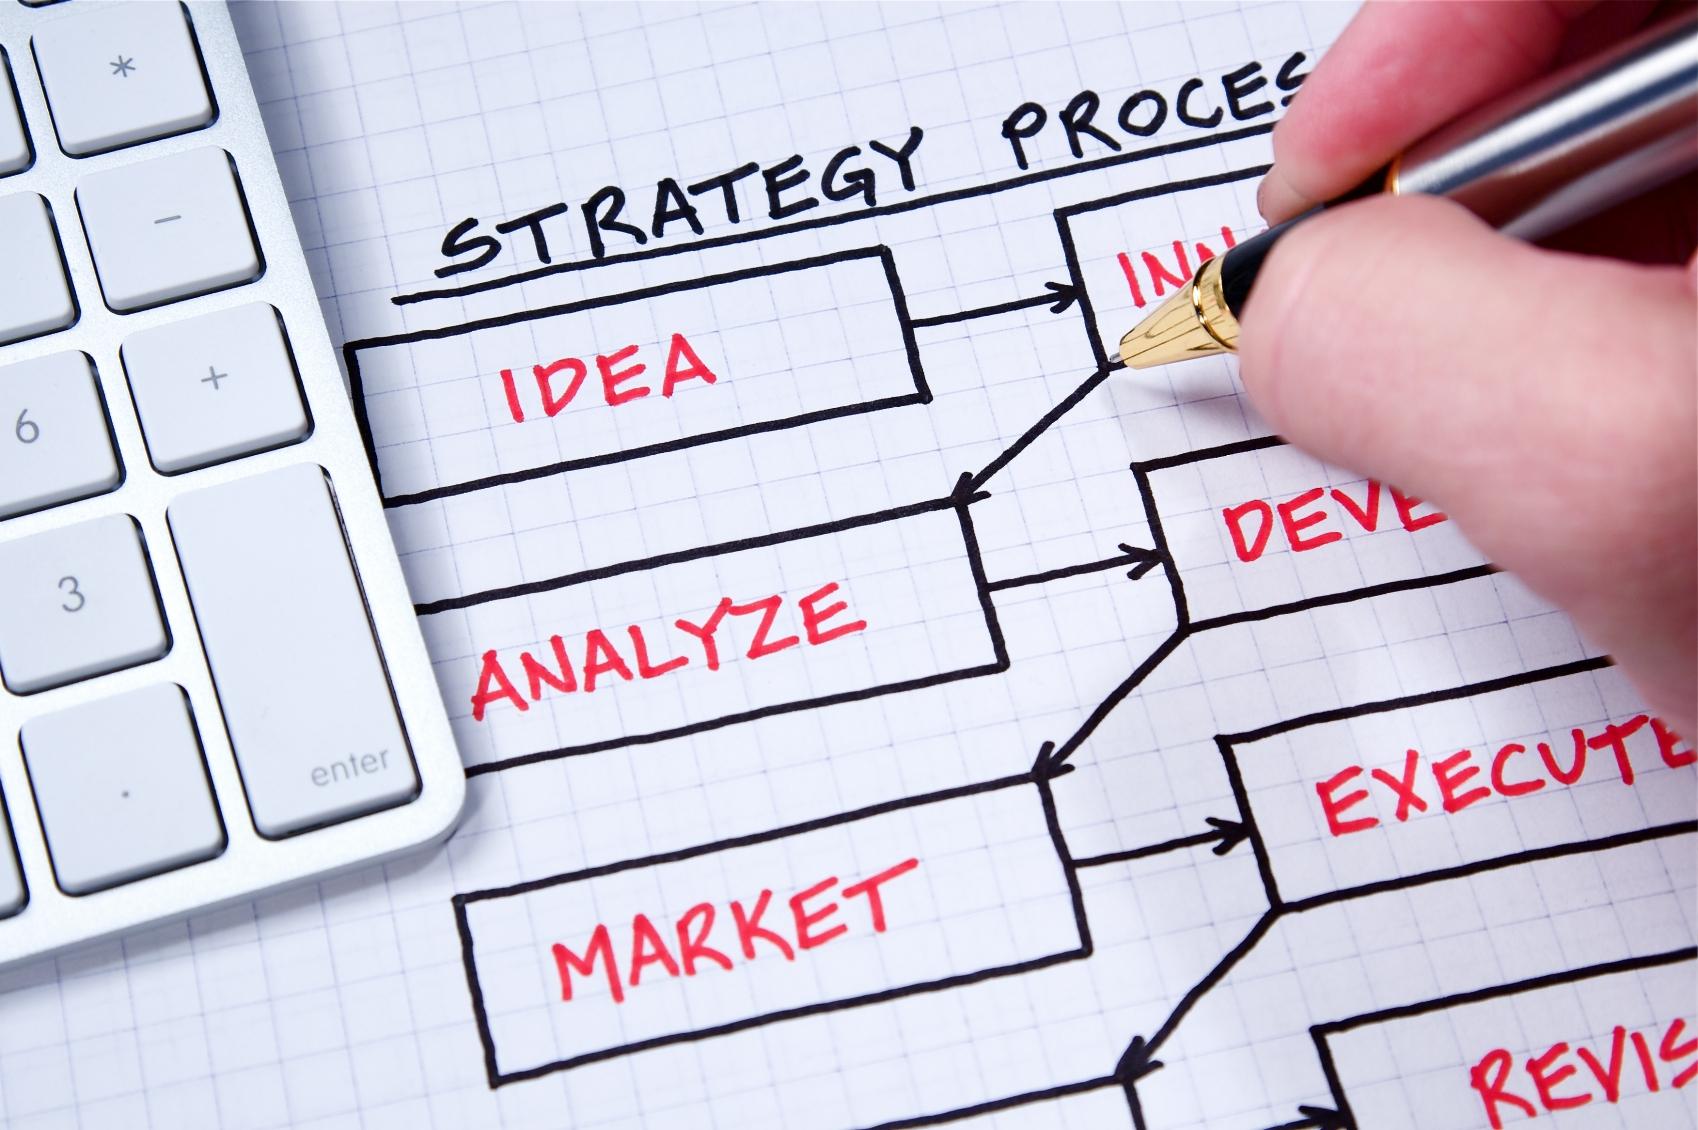 Running a Great Strategy Review تنفيذ متابعة الاستراتيجية